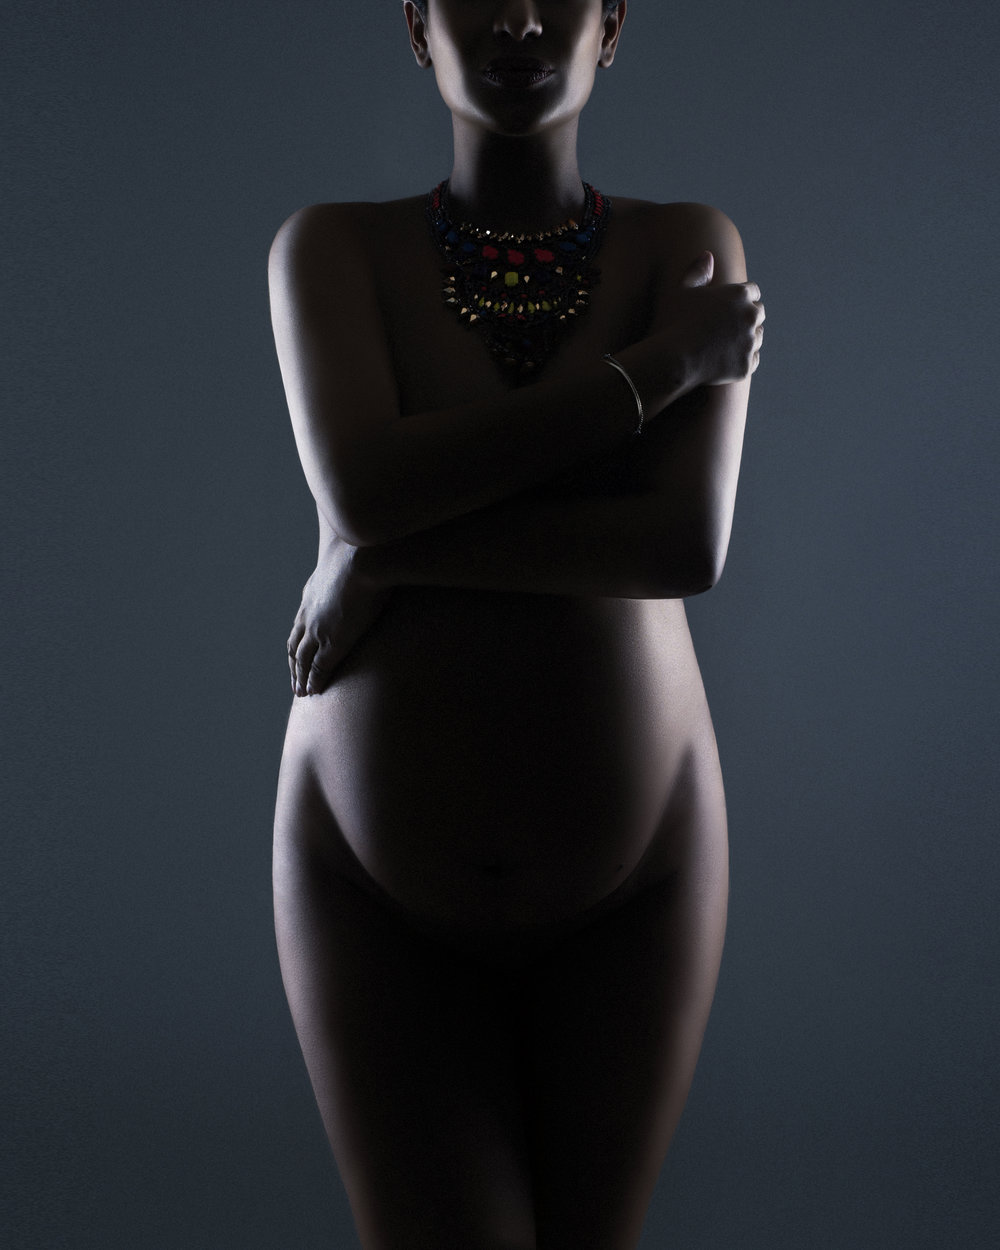 Artistic nude maternity photographs by awards winning photographer Liliya Lubenkova Portraits, Vancouver BC